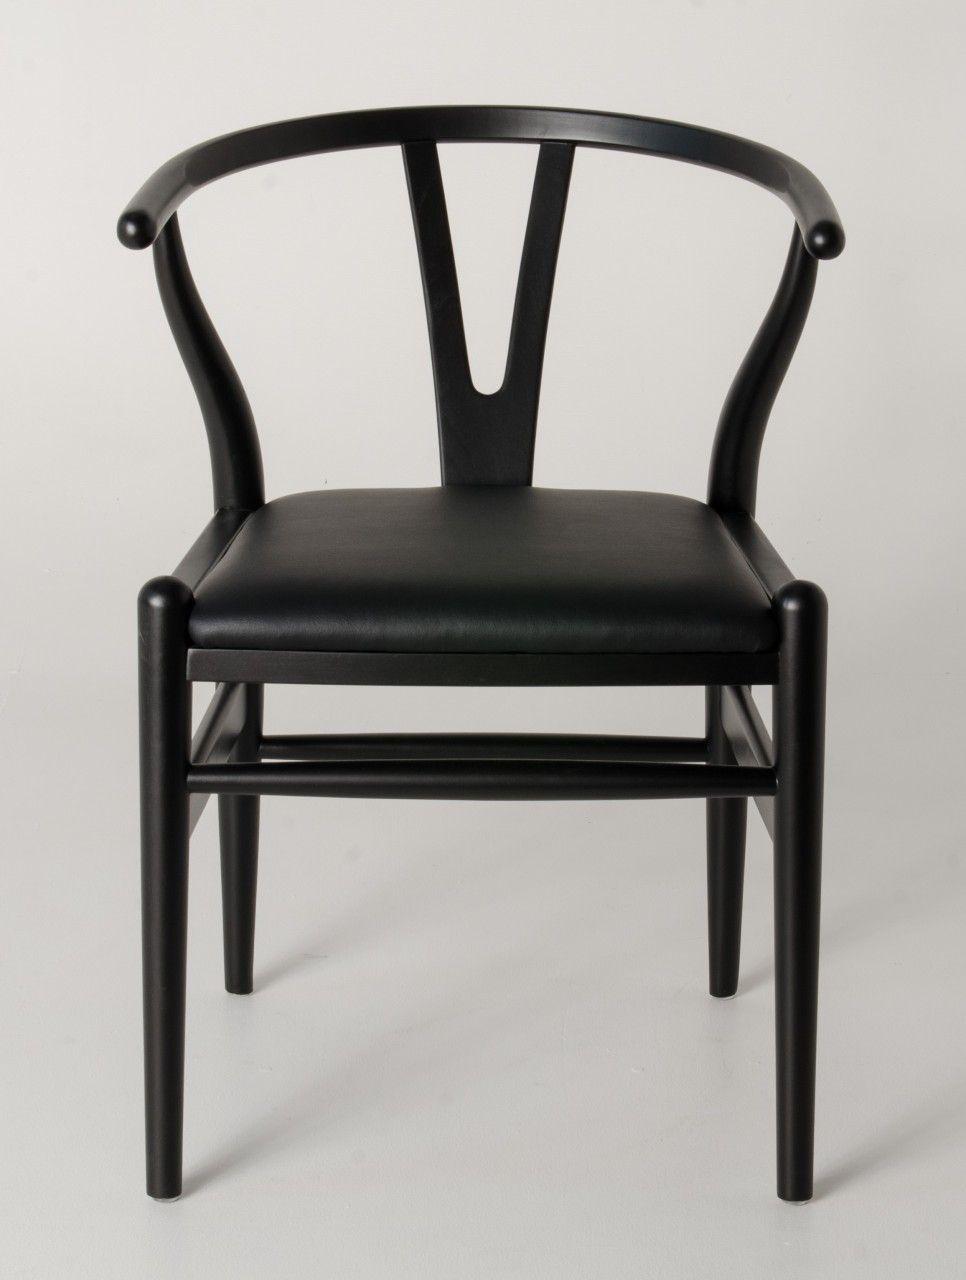 replica hans wegner ch24 wishbone chair black frame with pu seat